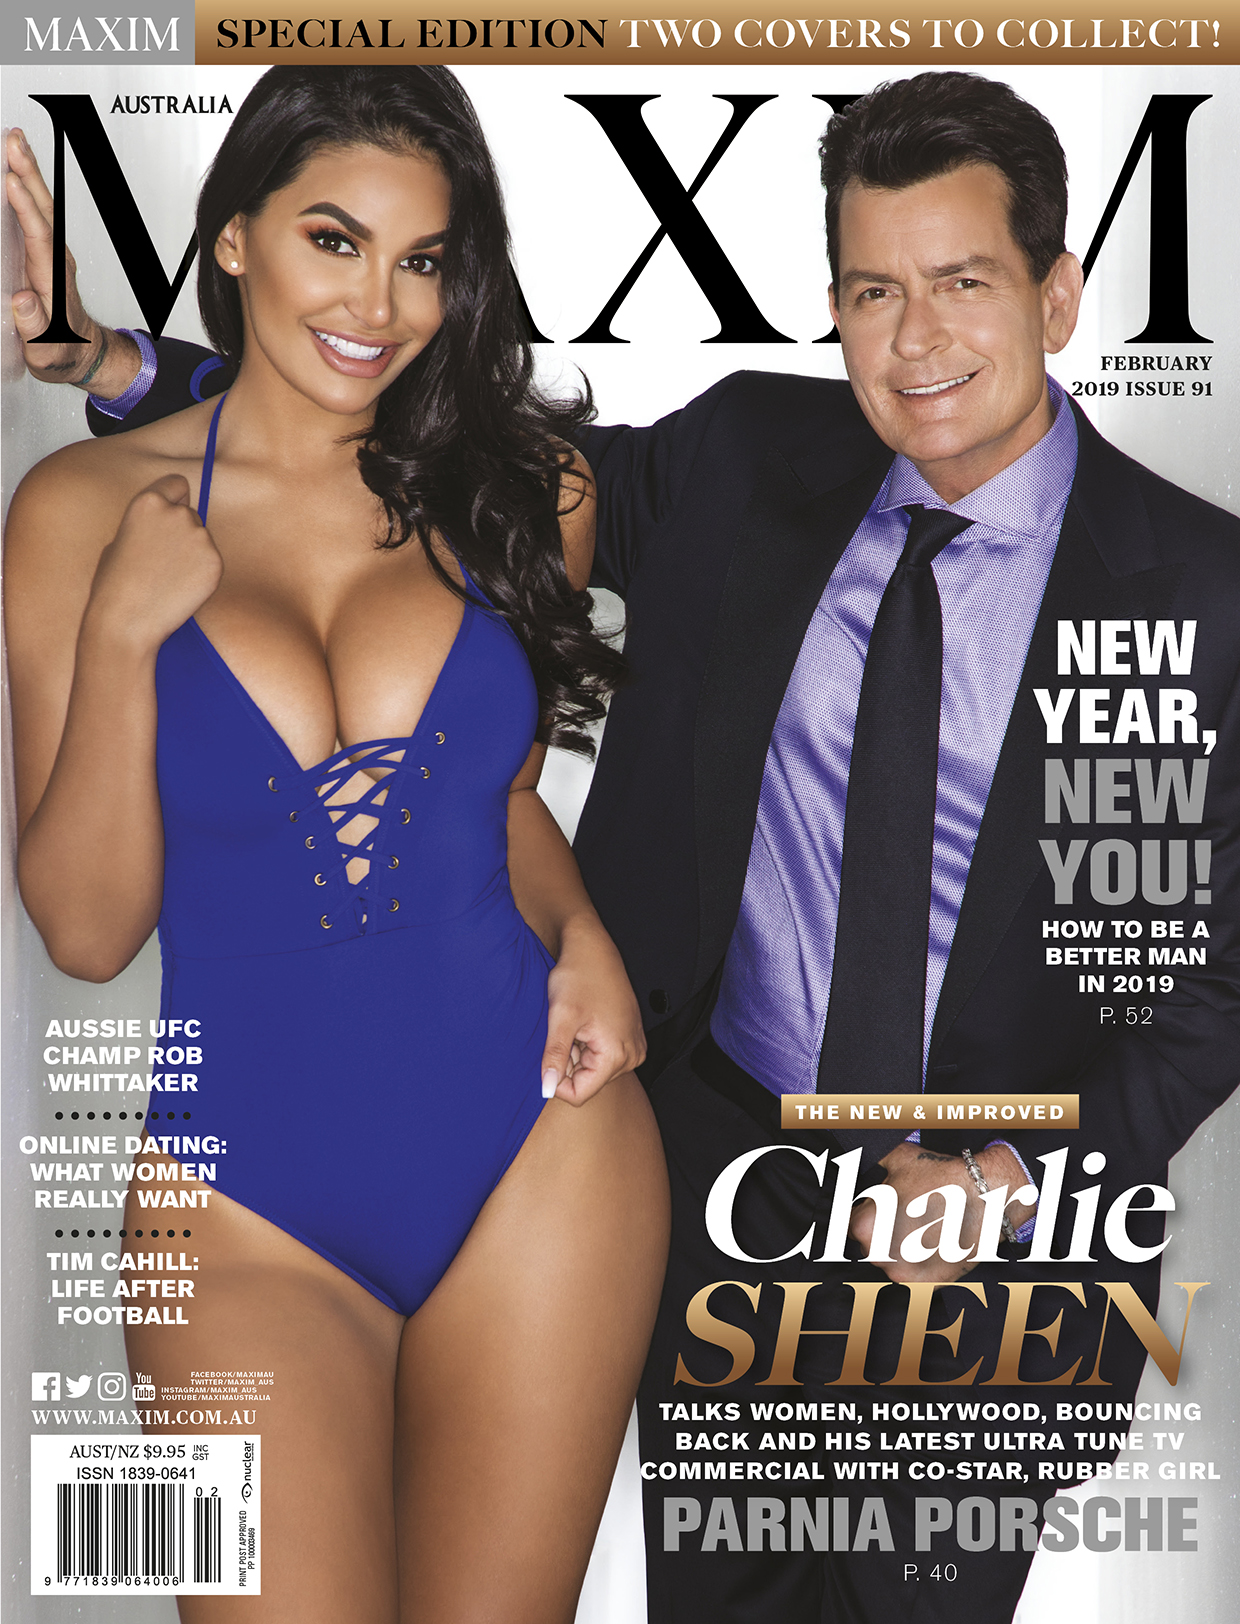 Parnia Porsche Charlie Sheen Maxim 2019